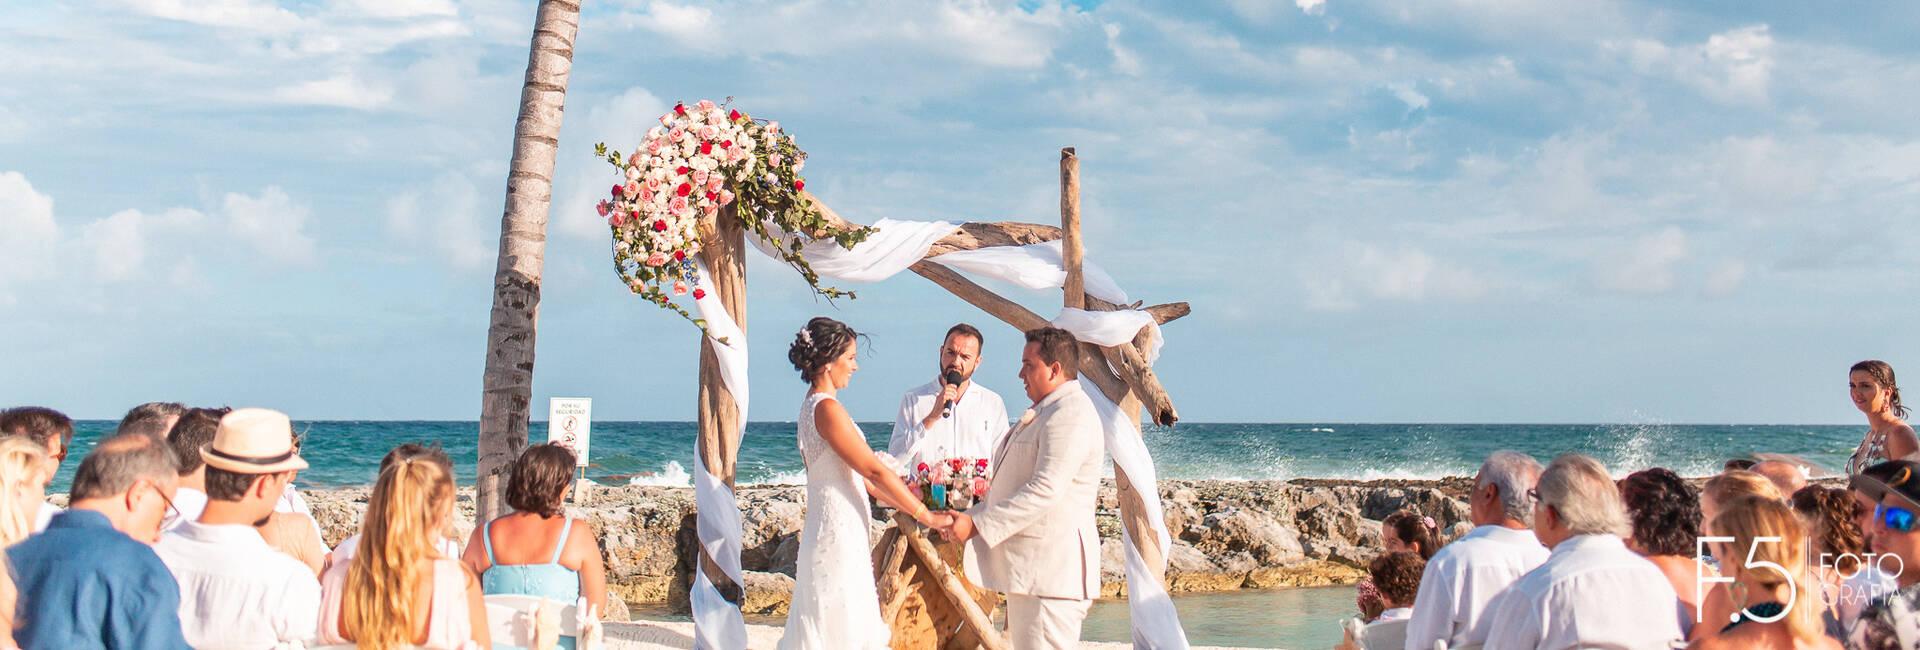 Casamento de Bruna & Caio